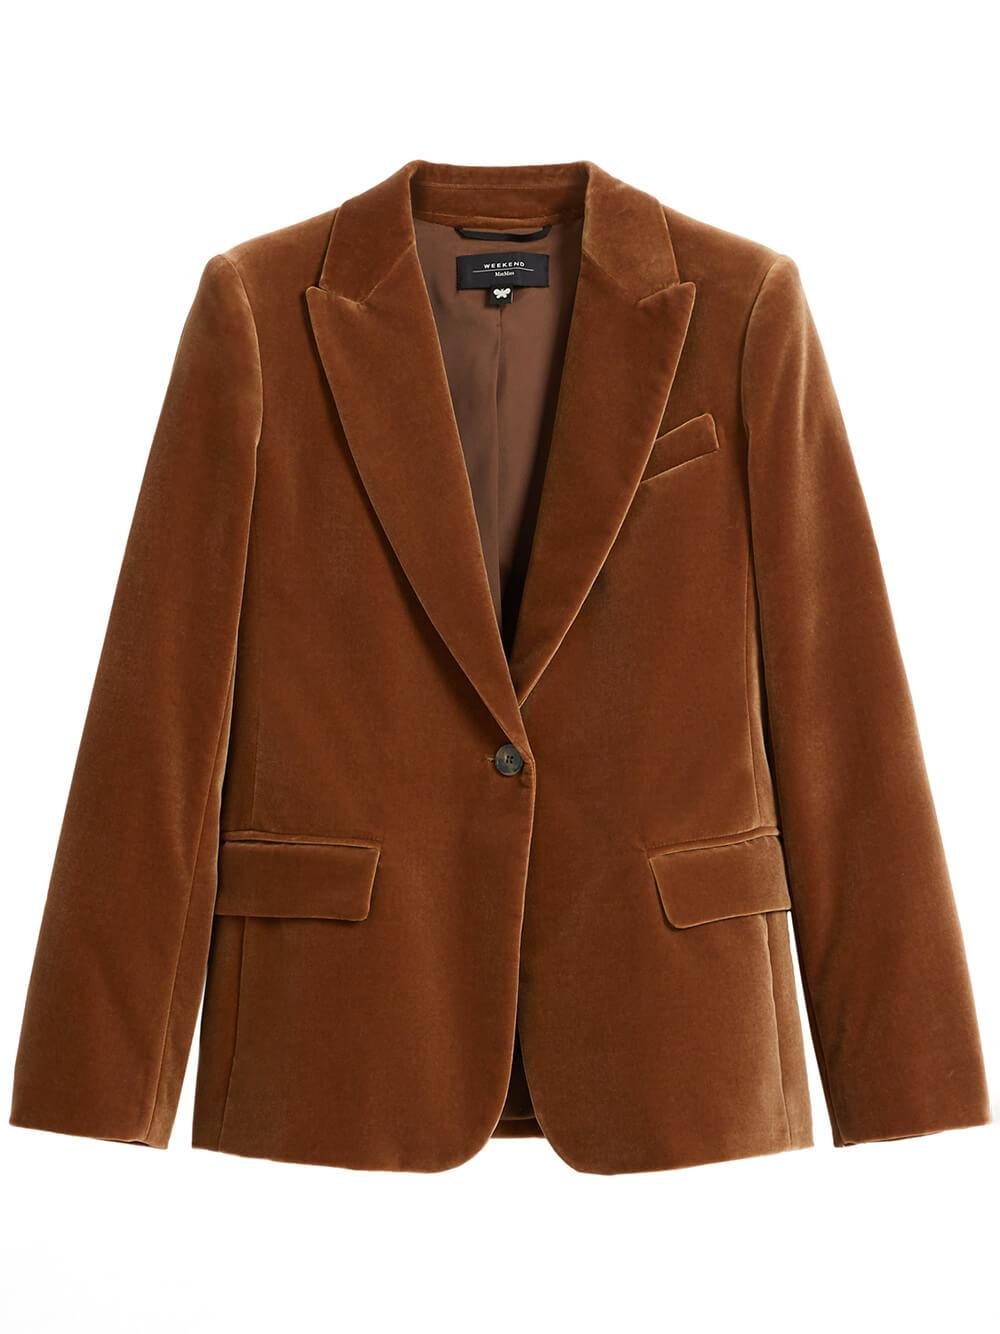 Falena One Button Velvet Blazer Item # 5046011306